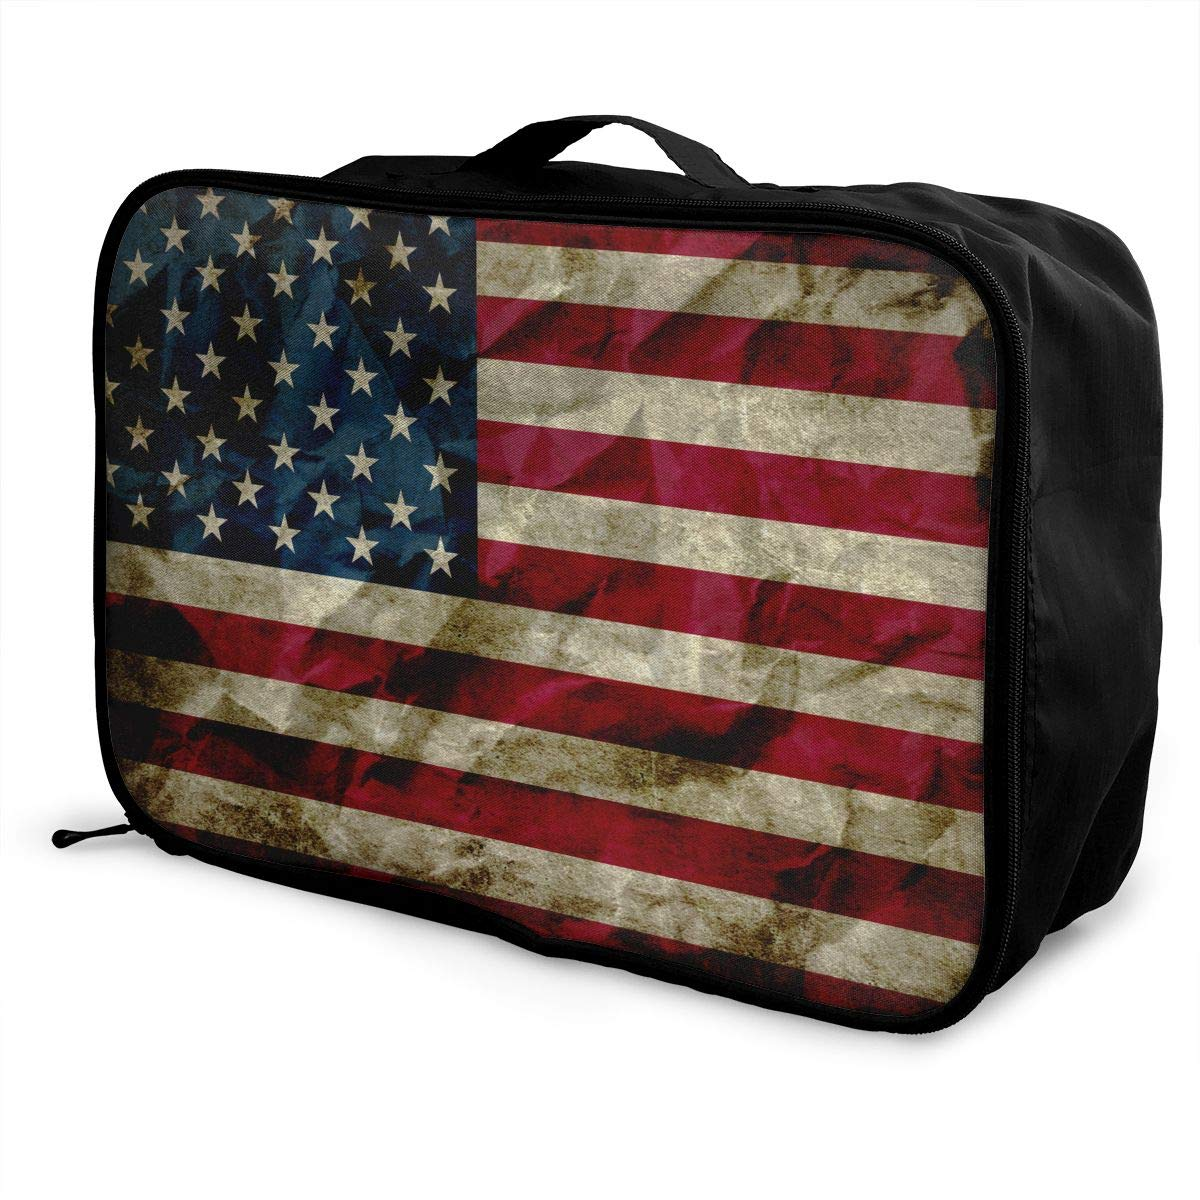 YueLJB USA Flag Lightweight Large Capacity Portable Luggage Bag Travel Duffel Bag Storage Carry Luggage Duffle Tote Bag